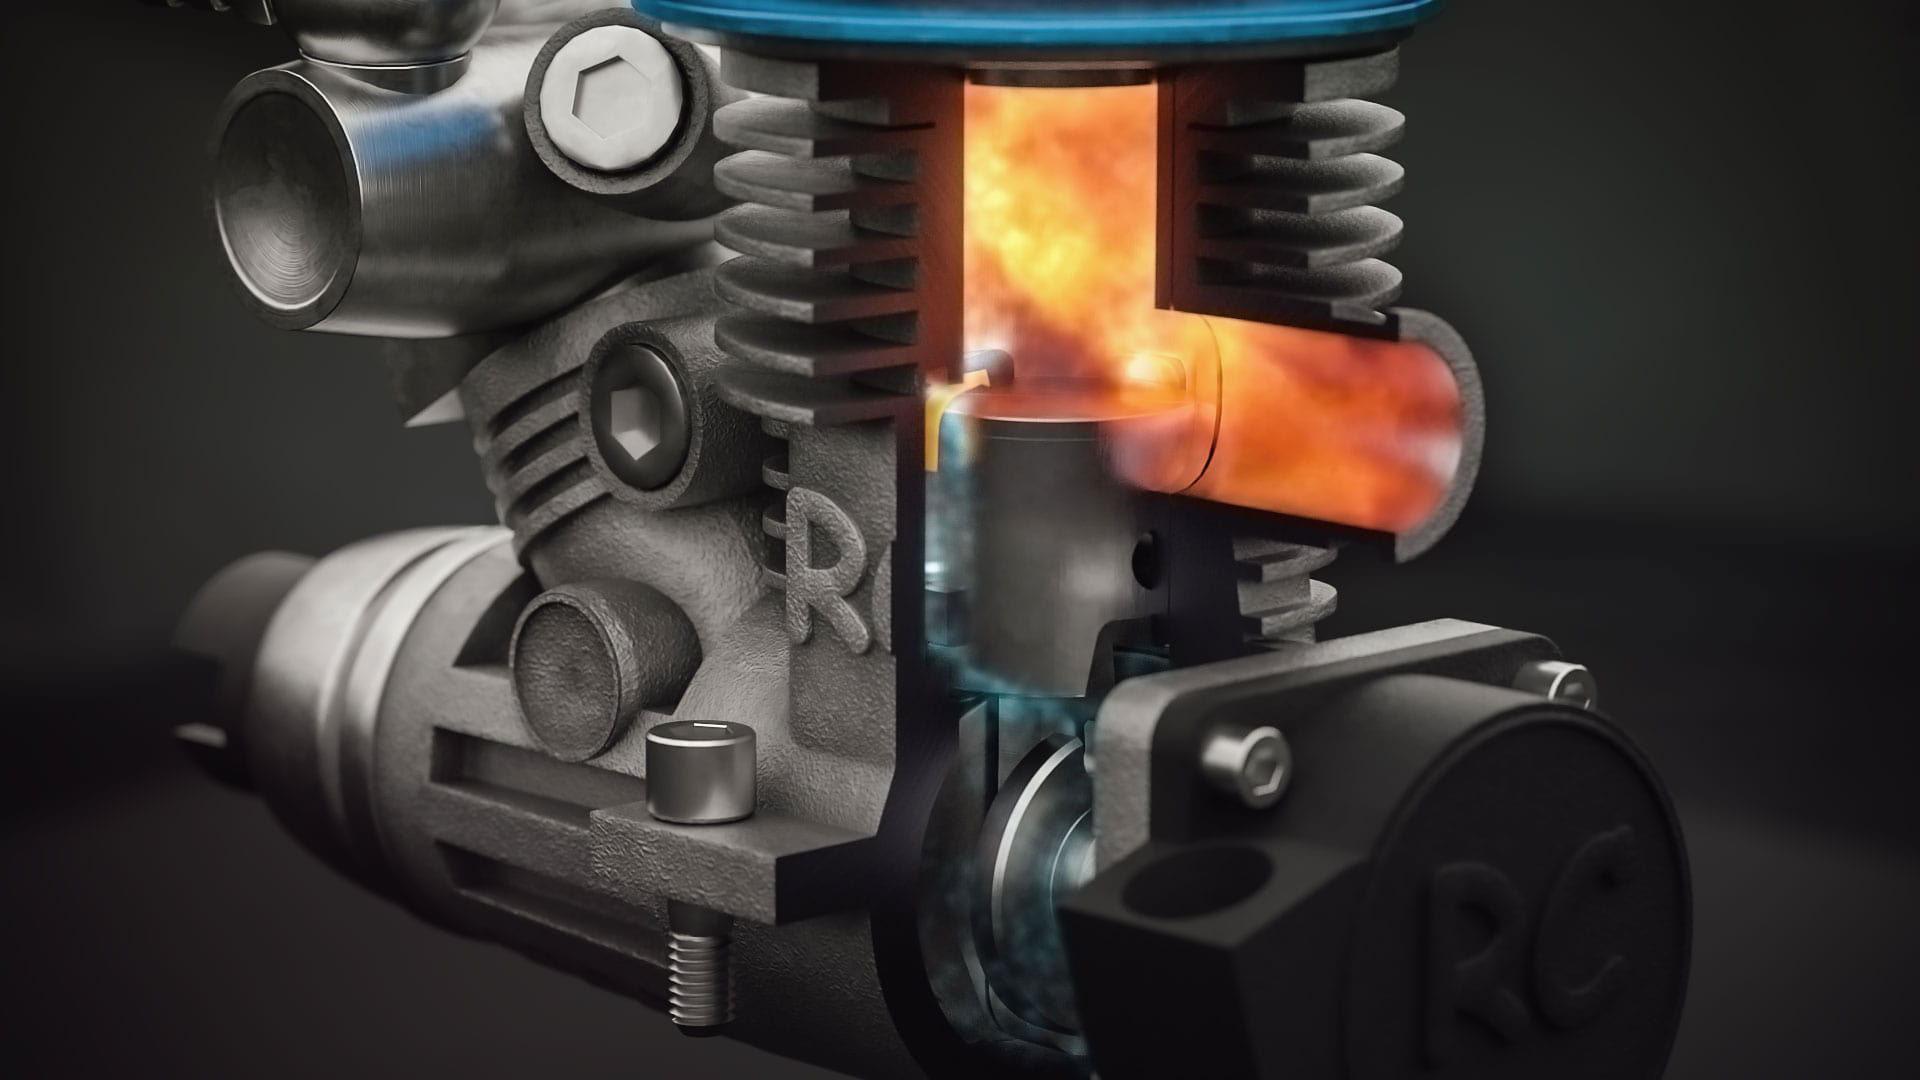 fourstroke engine animated engines matt keveney - HD1920×1080